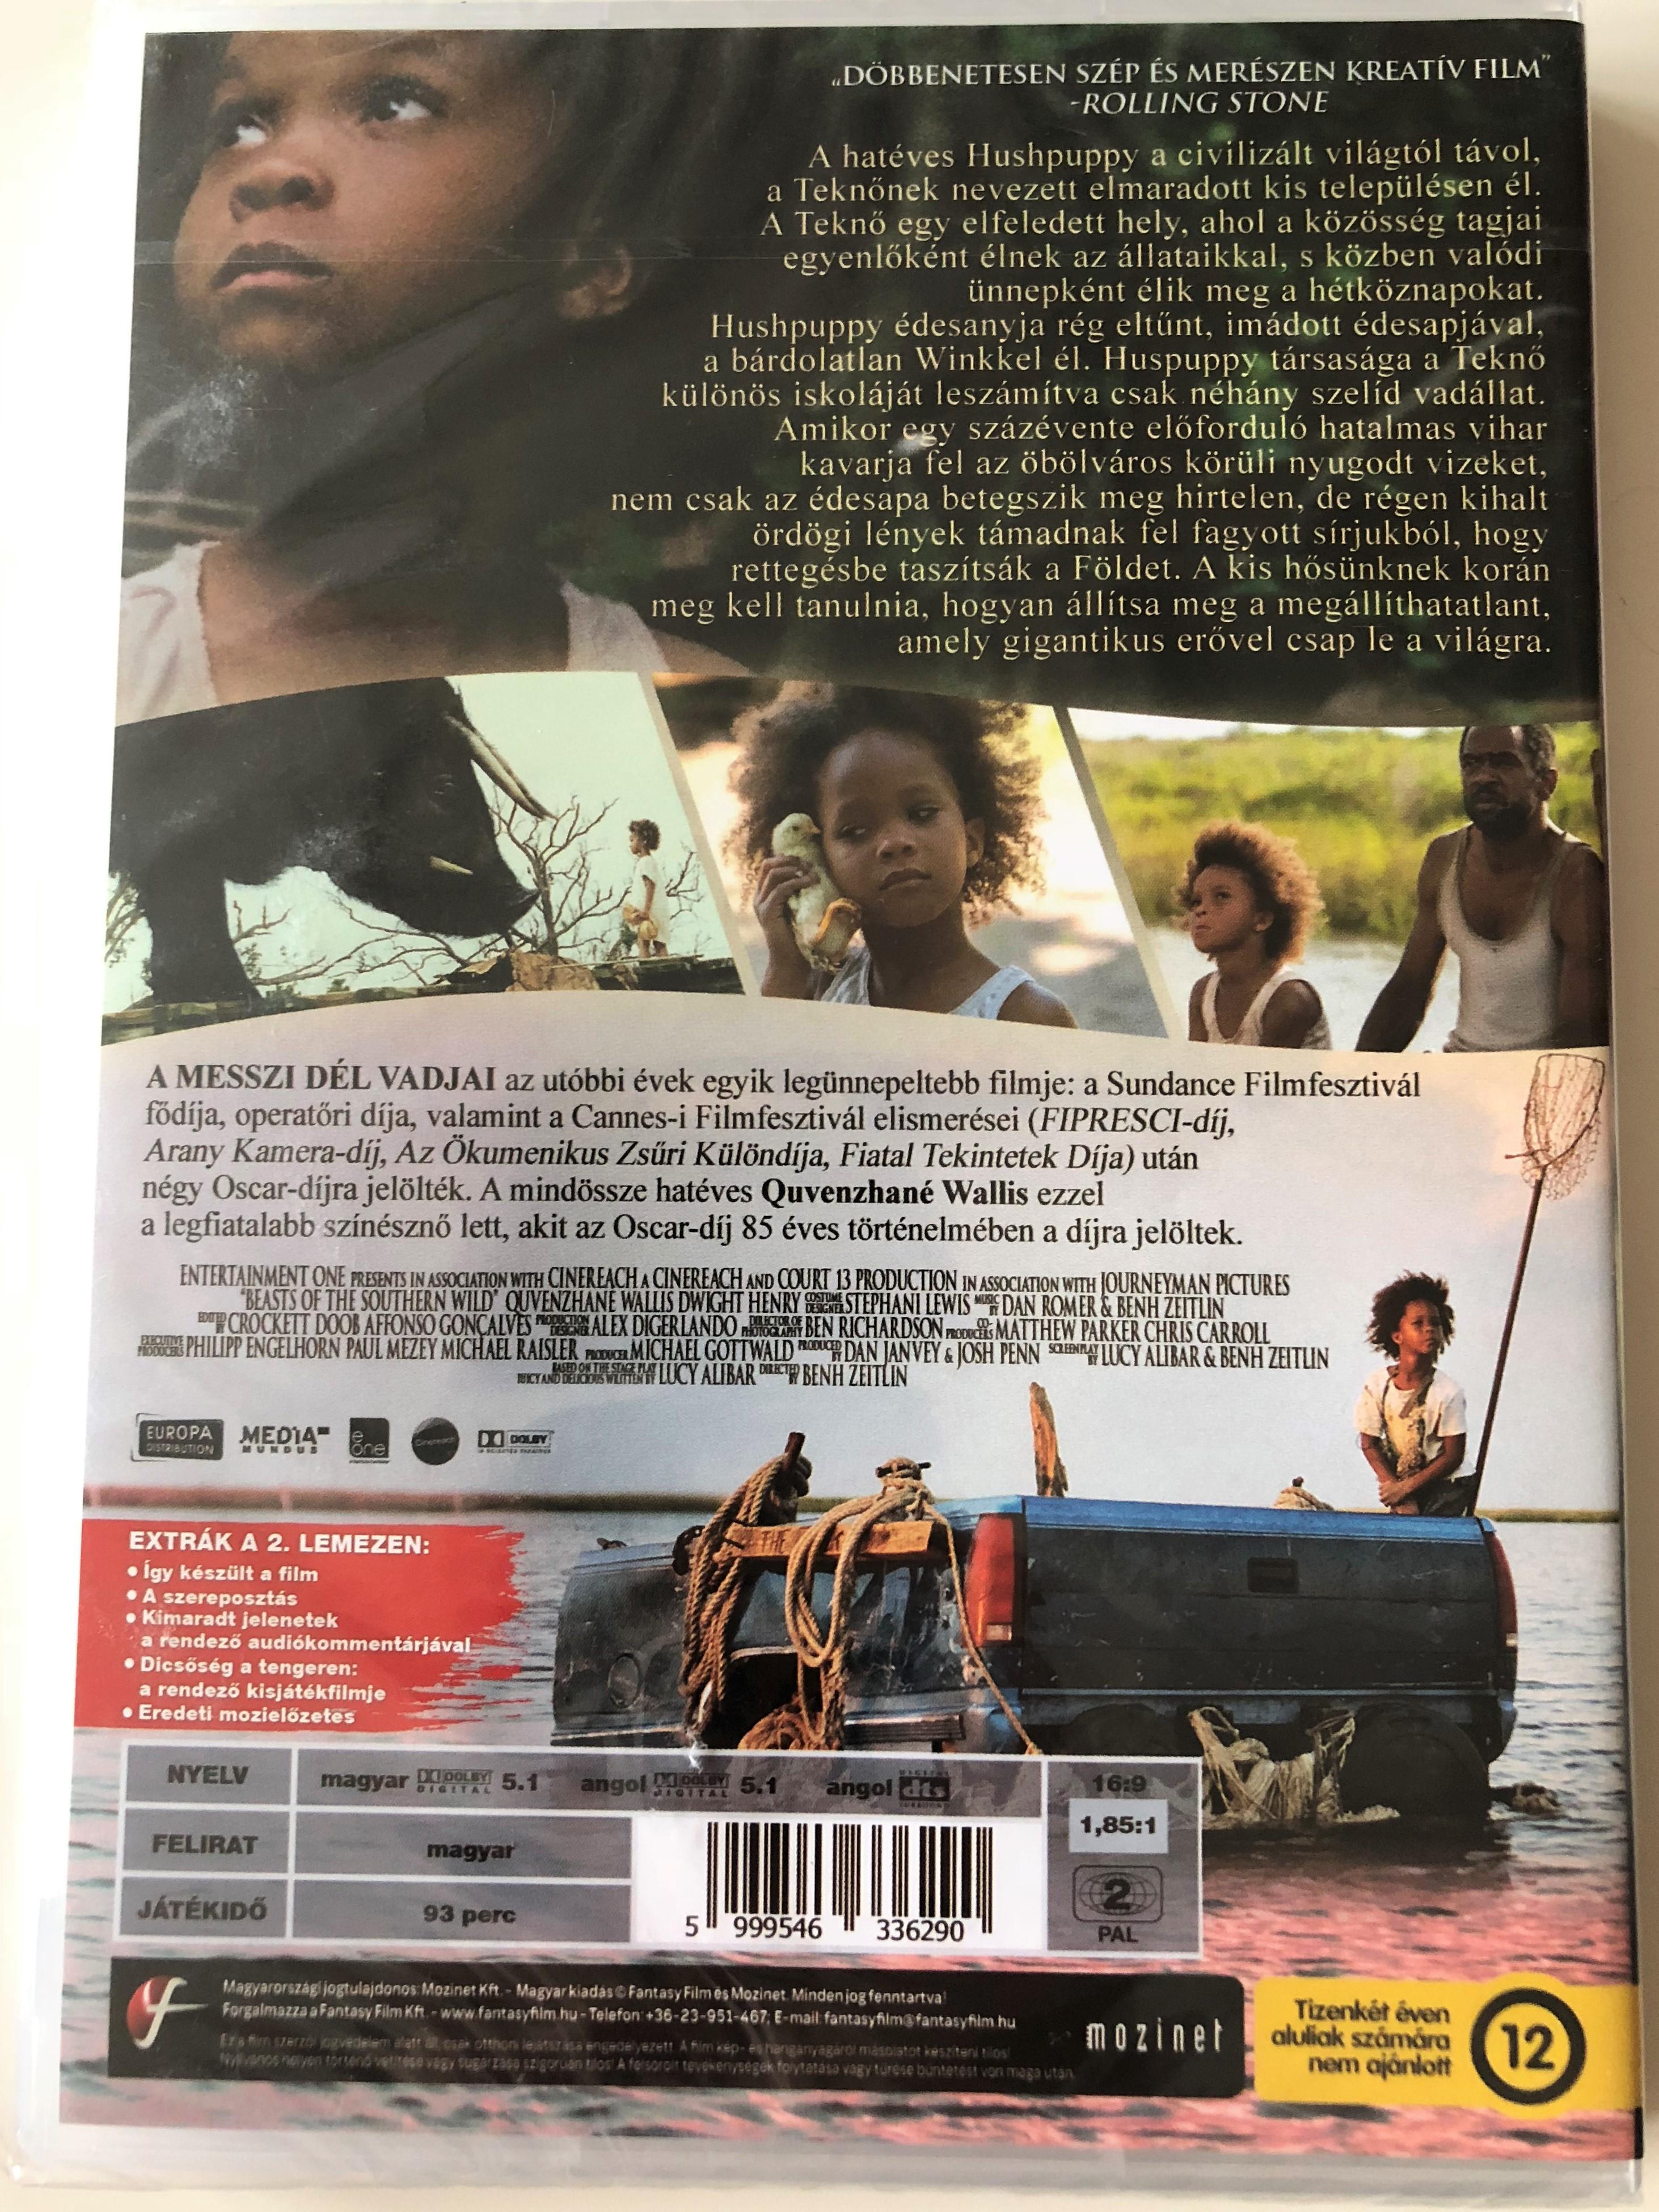 beasts-of-the-southern-wild-dvd-2012-a-messzi-d-l-vadjai-directed-by-benh-zeitlin-starring-quvenzhan-wallis-dwight-henry-2-dvd-extra-edition-2-.jpg